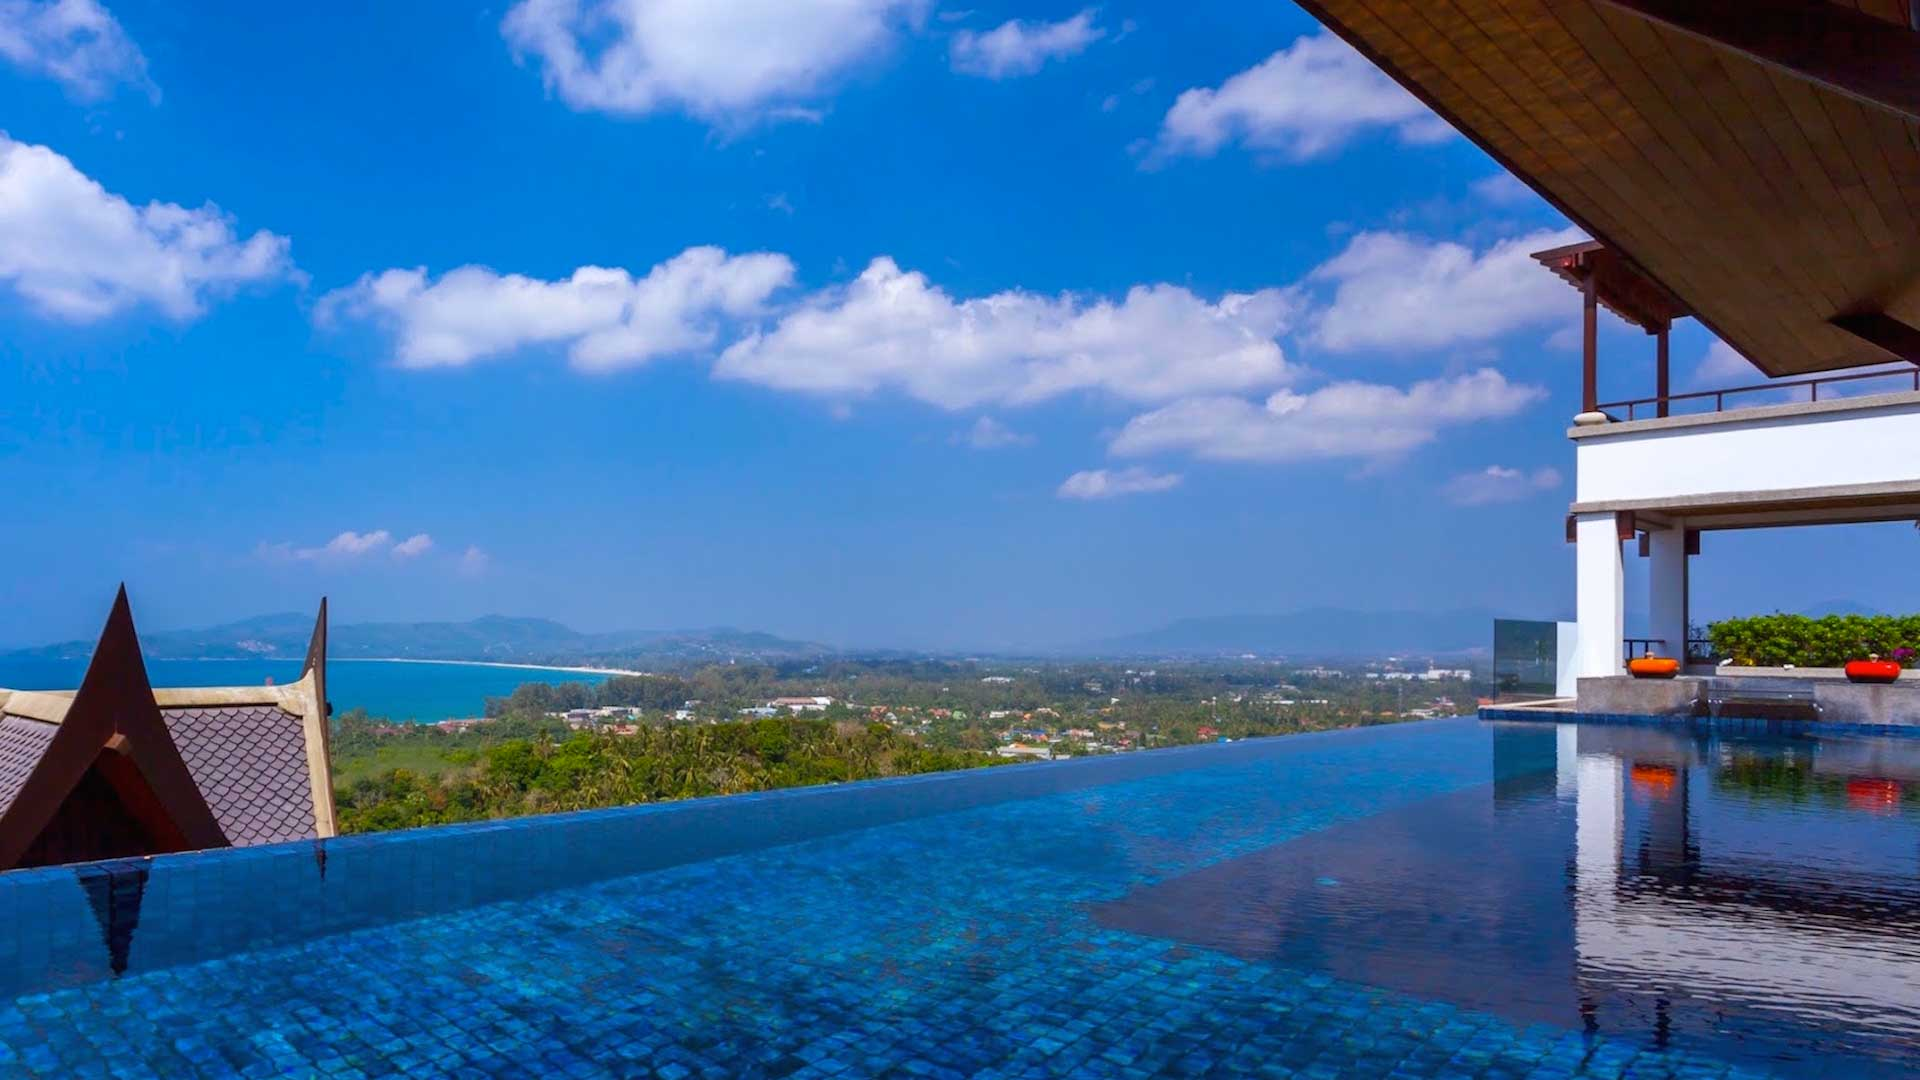 villa yanggy villa mieten in phuket surin beach villanovo. Black Bedroom Furniture Sets. Home Design Ideas